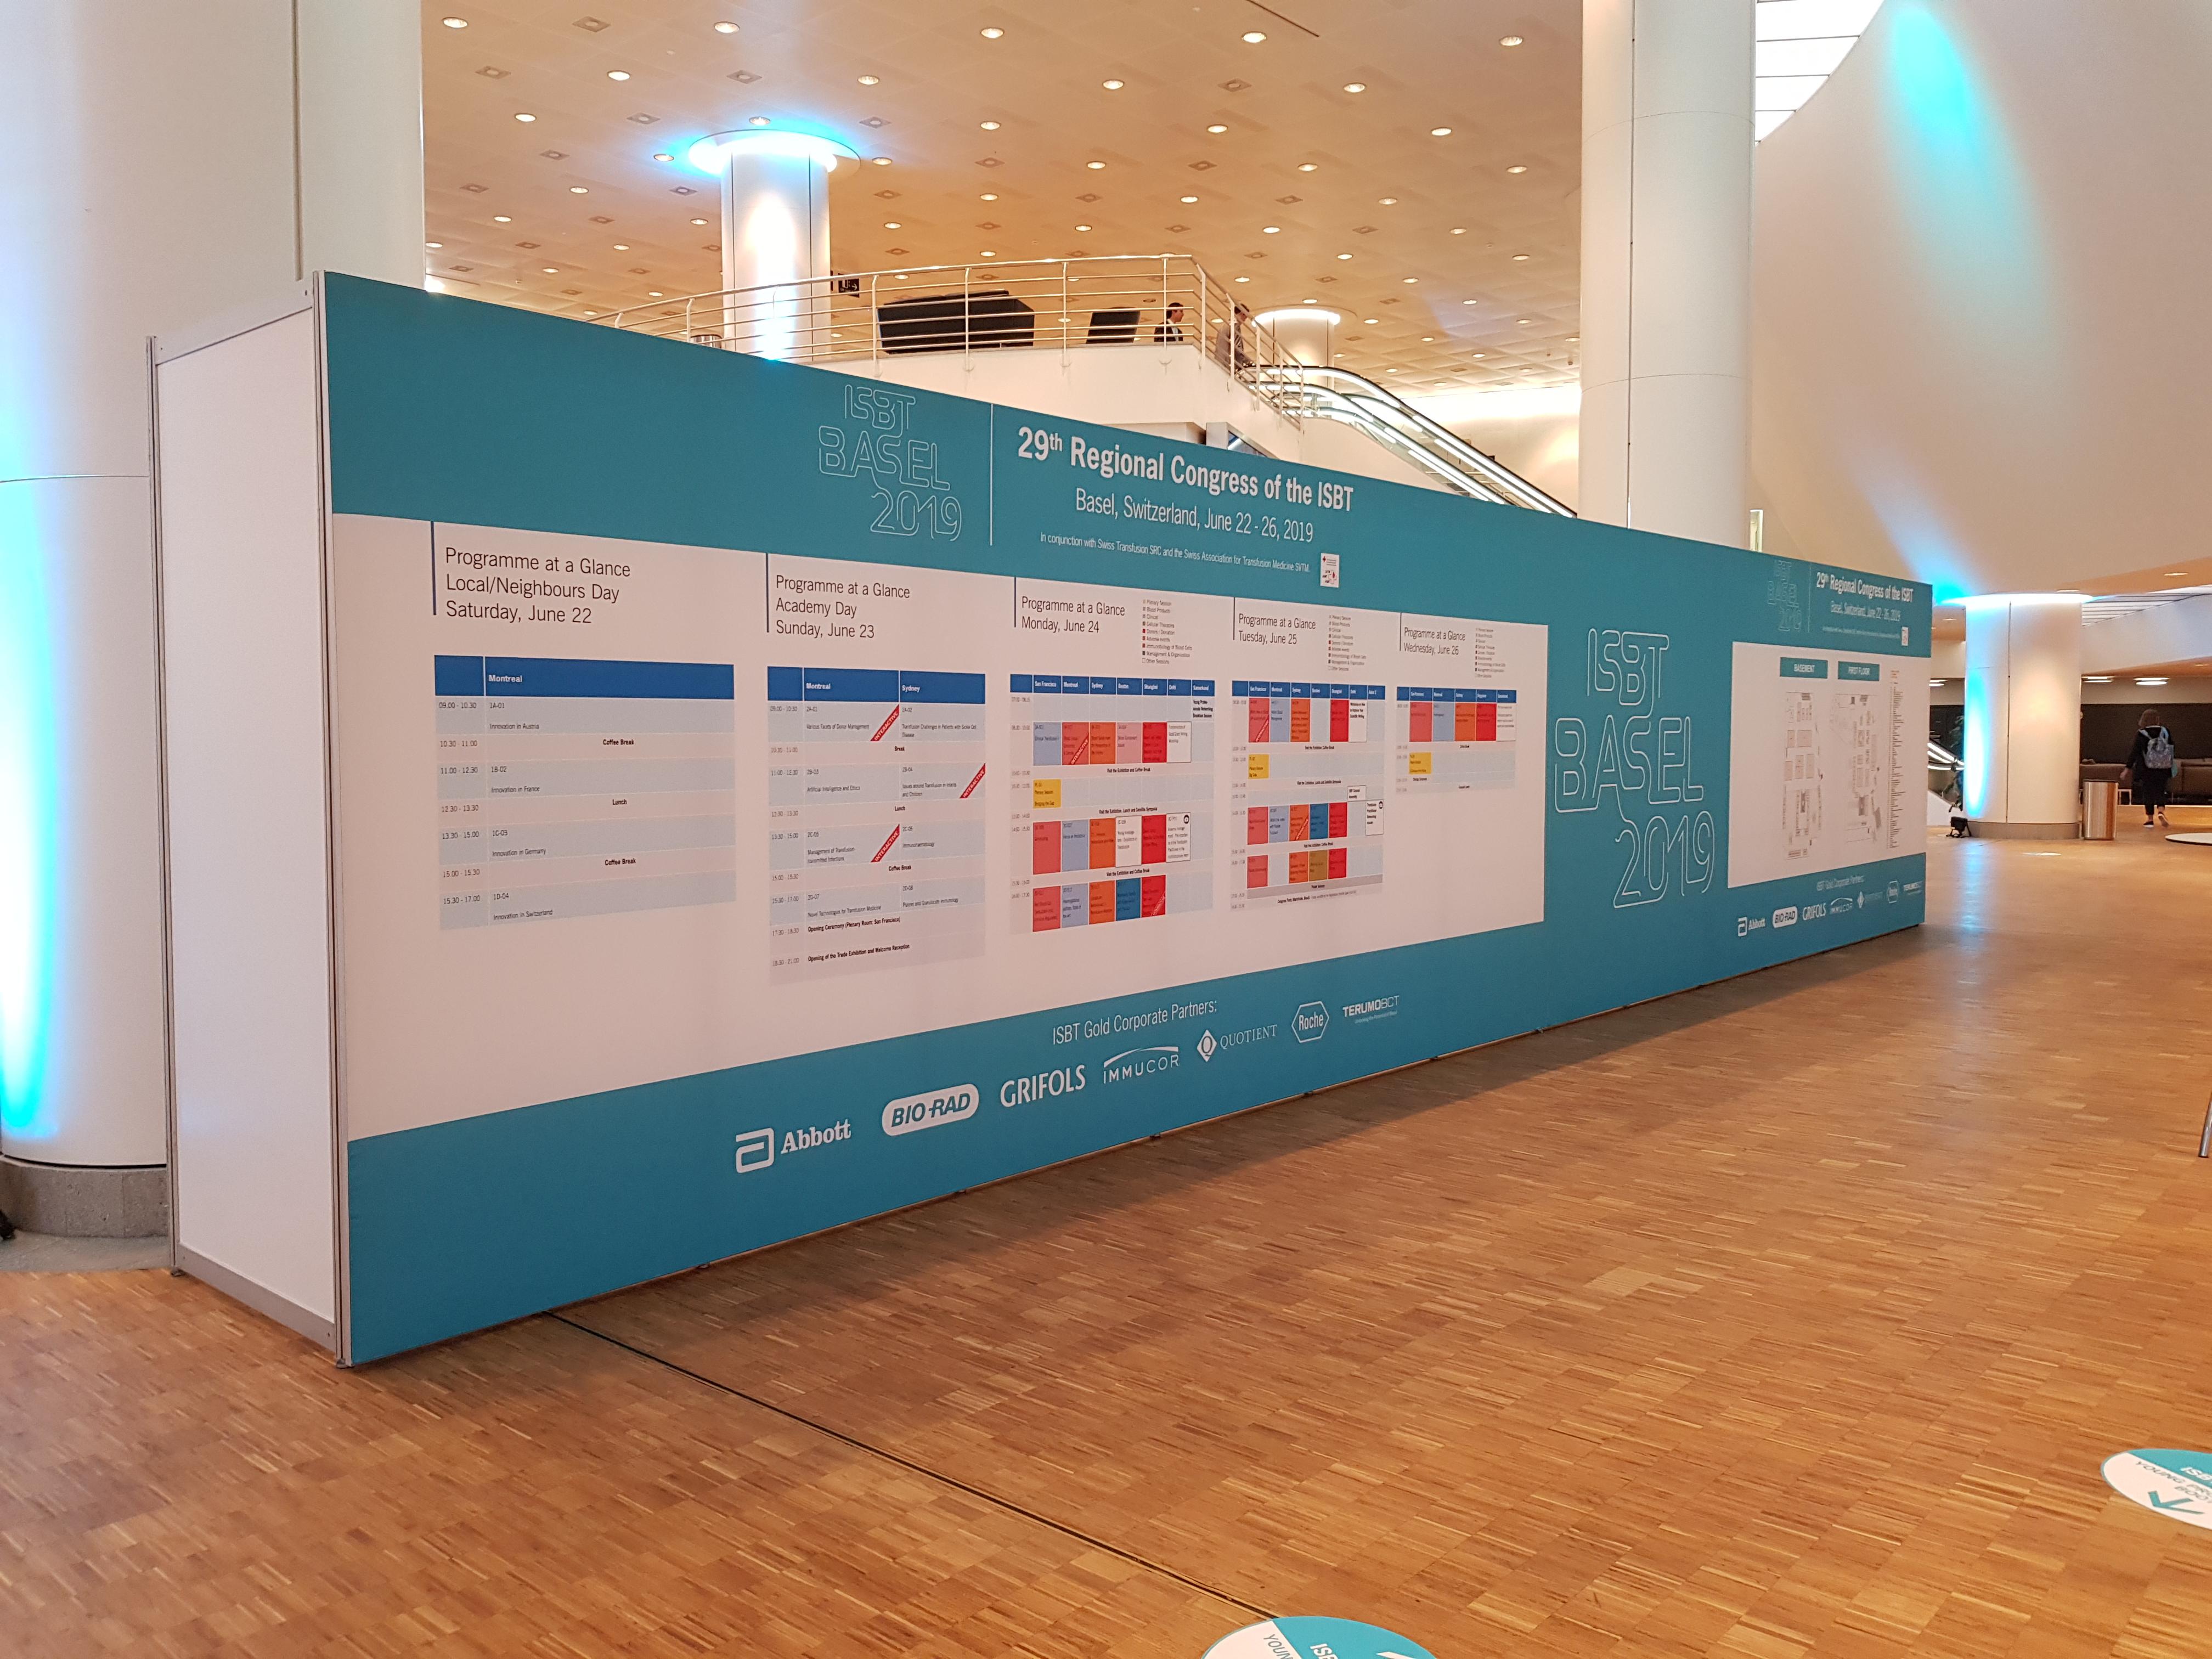 PROGRAMM ISBT Basel 2019